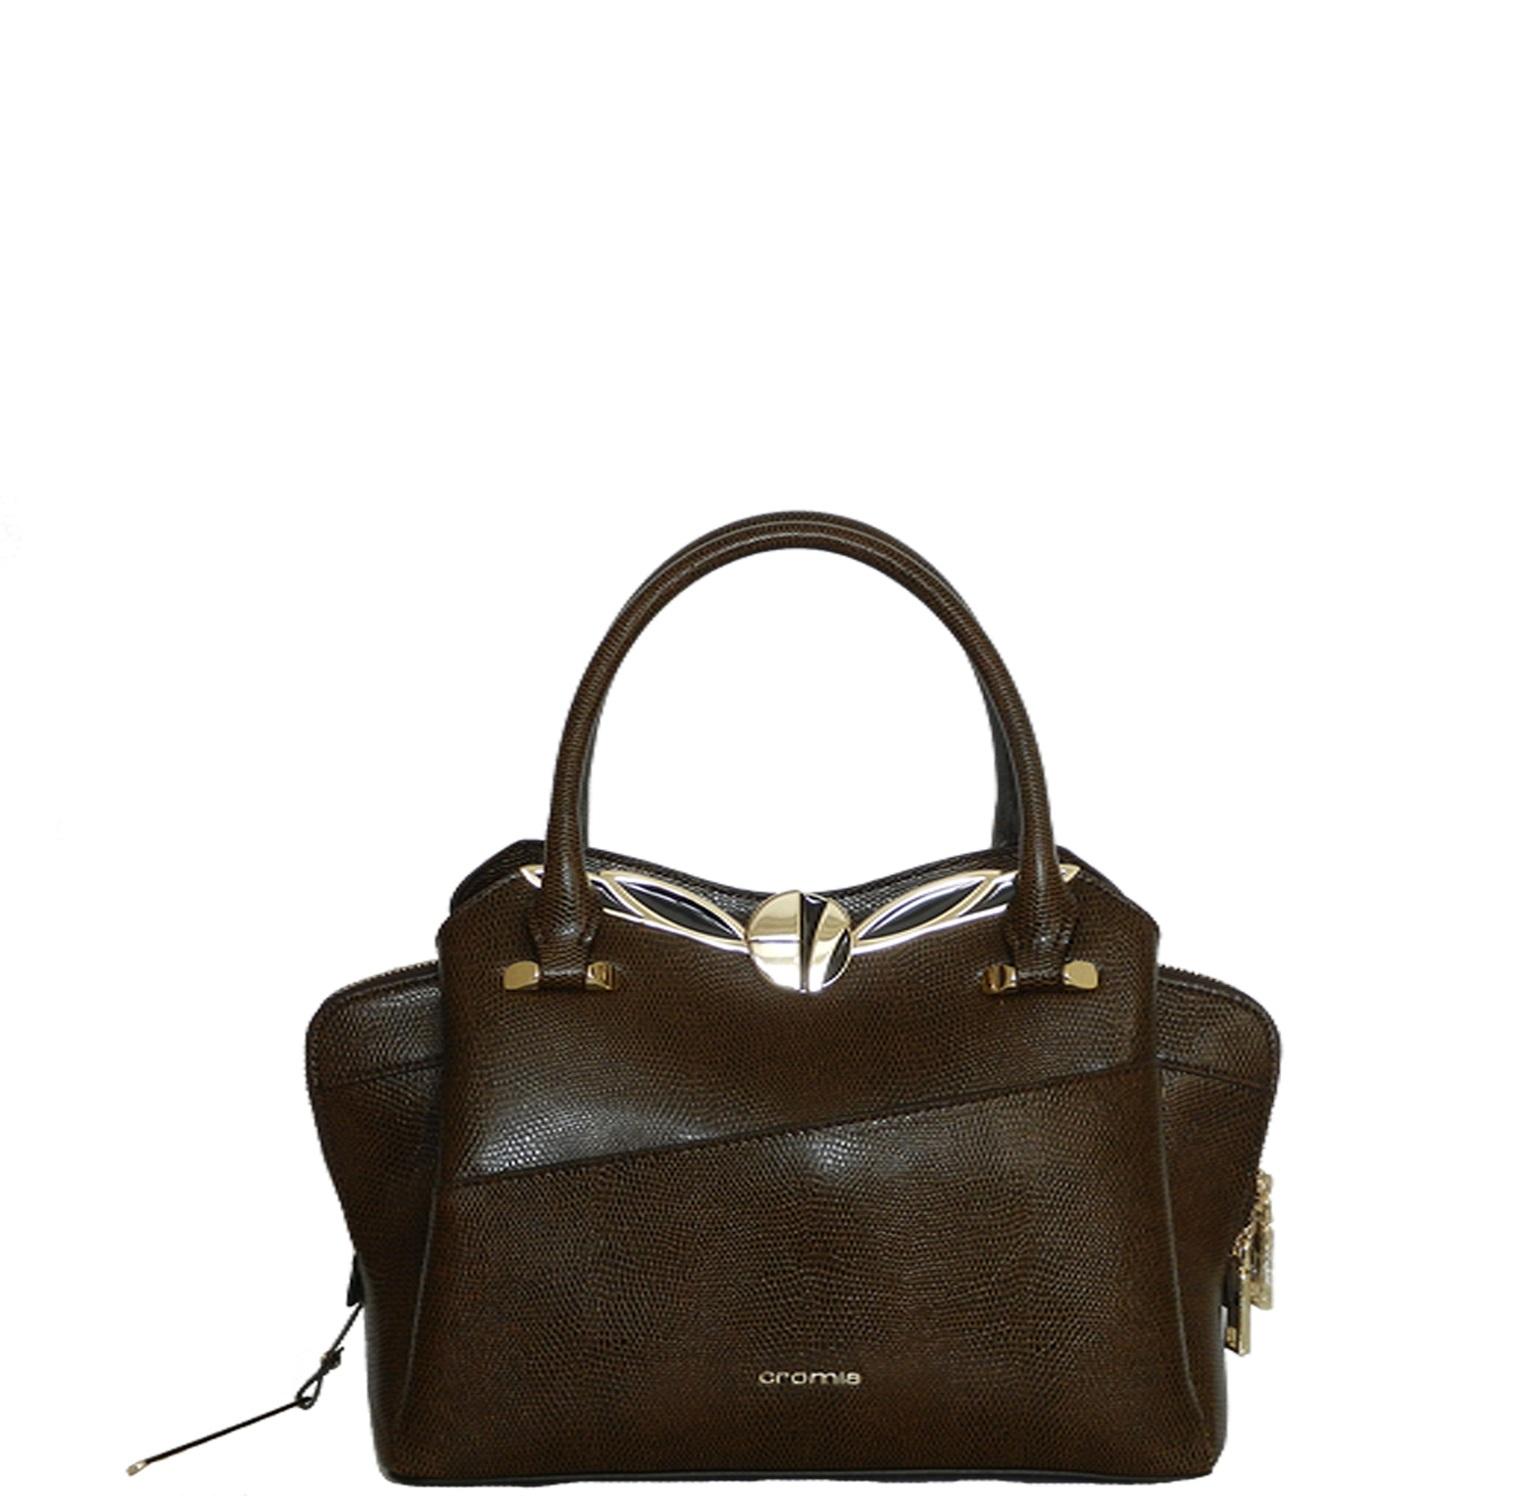 df3d5f8391d7 Средняя сумка Cromia 1404315 коричневая - цена 14000 руб, купить